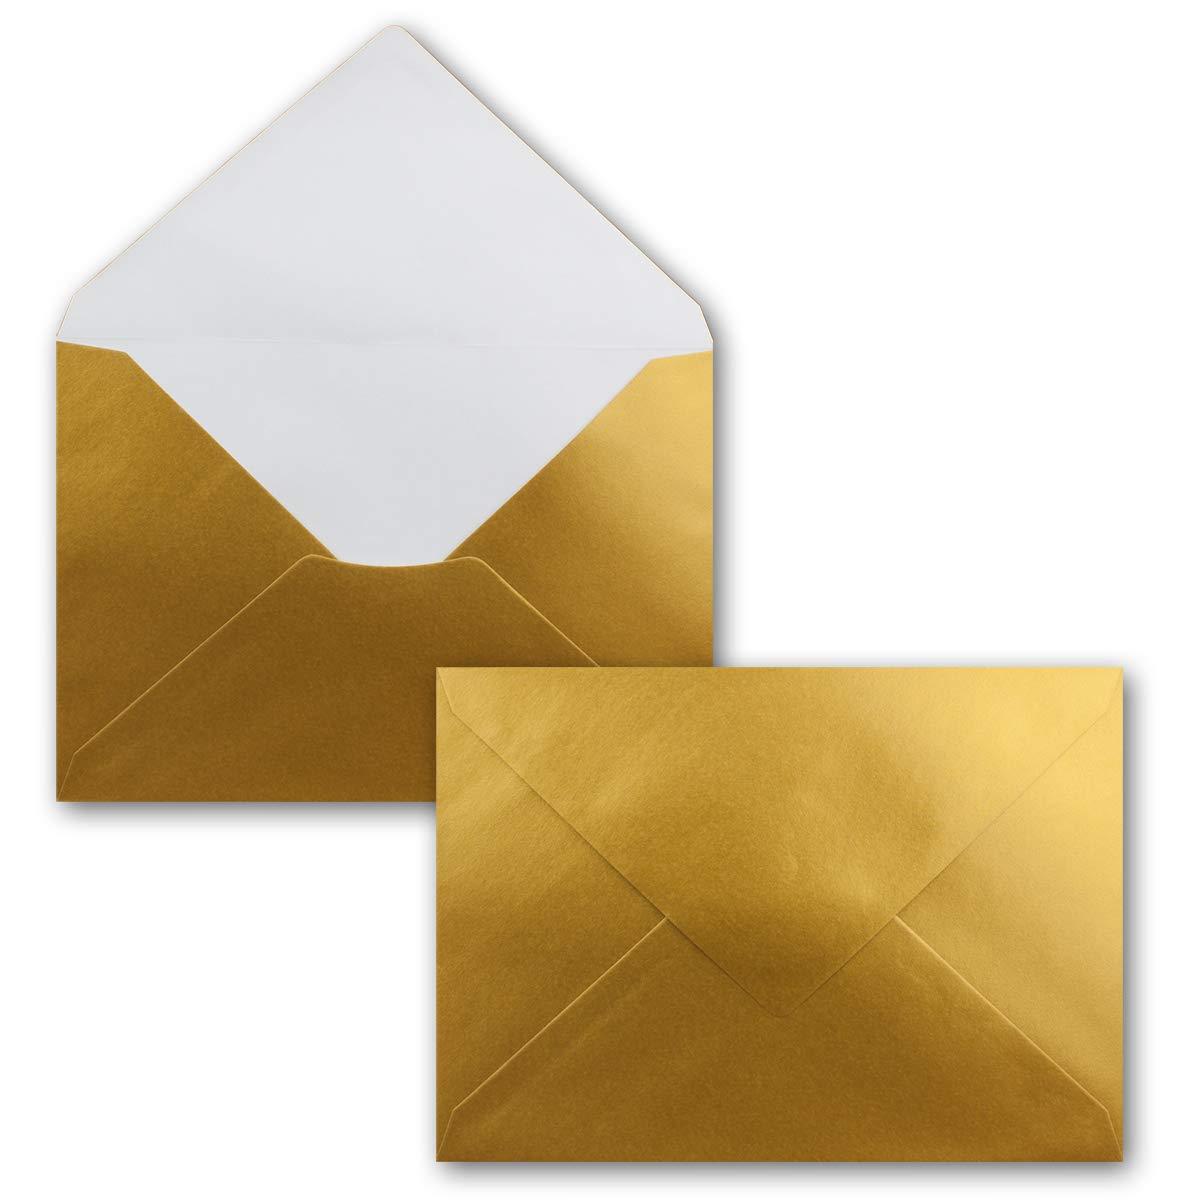 75 Sets - Faltkarten Hellgrau - Din Din Din A5  Umschläge Din C5 - Premium Qualität - Sehr formstabil - Qualitätsmarke  NEUSER FarbenFroh B07Q3QQRGH | Zart  14a8cd